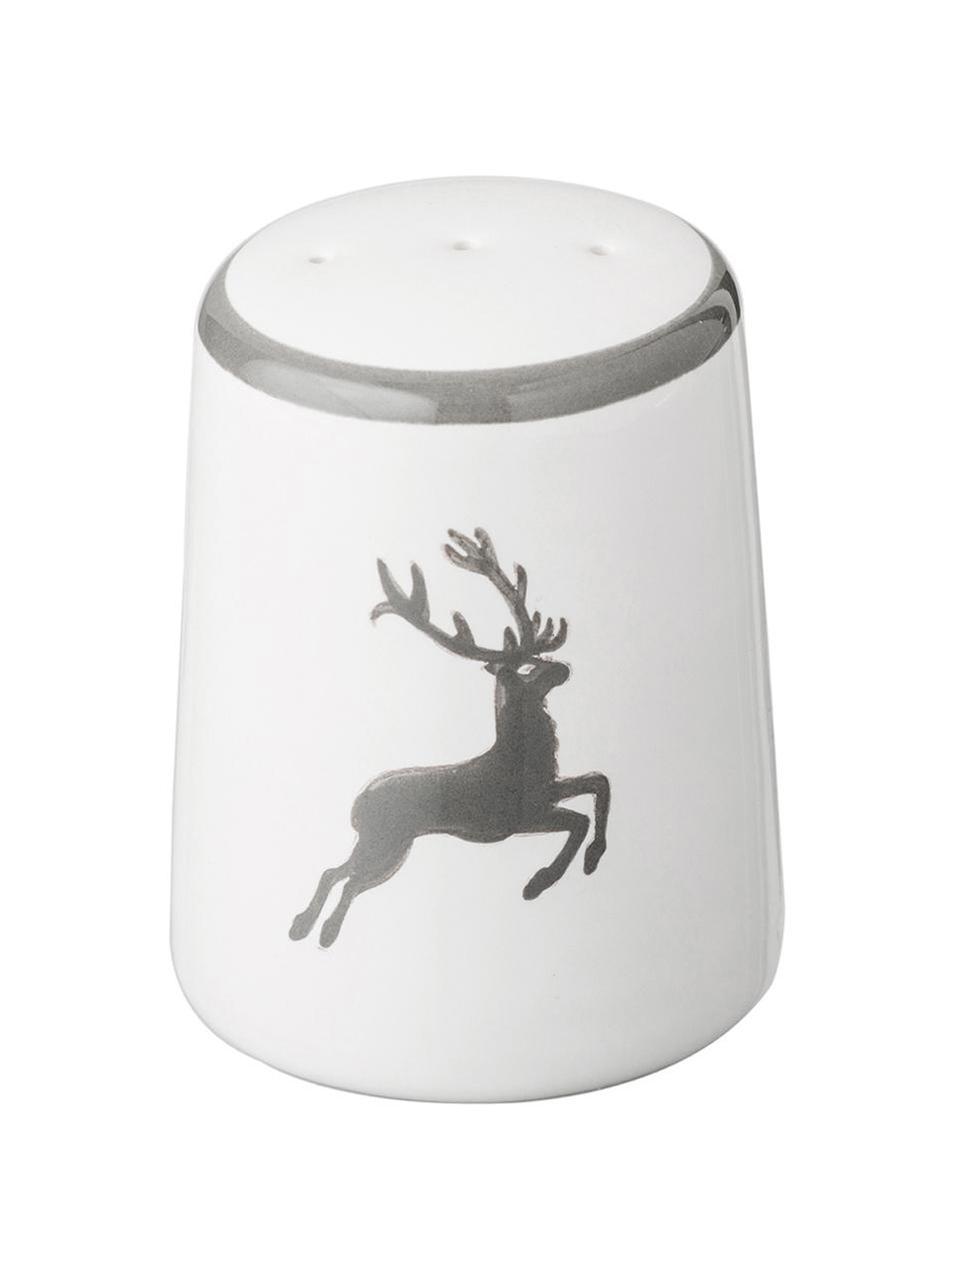 Handbemalter Pfefferstreuer Classic Grauer Hirsch, Keramik, Grau,Weiß, 4 x 6 cm